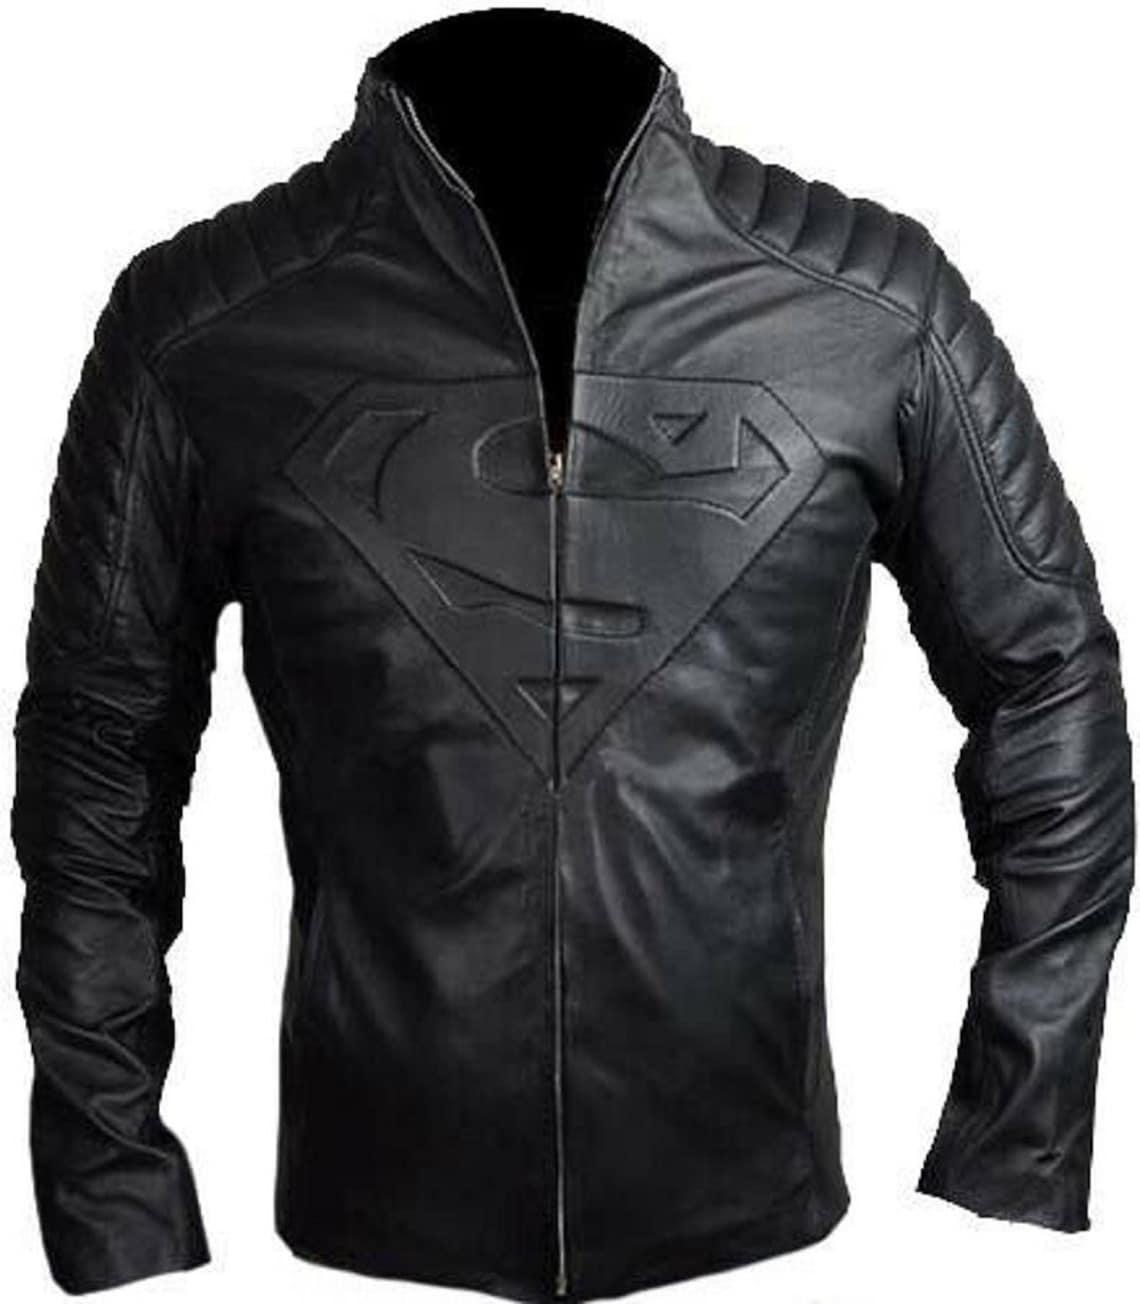 100% Real New Superman Luxury Durable Genuine Leather Lambskin Sheepskin Coat Black Motorcycle Biker Jacket With Zipper Collar Up Sl18